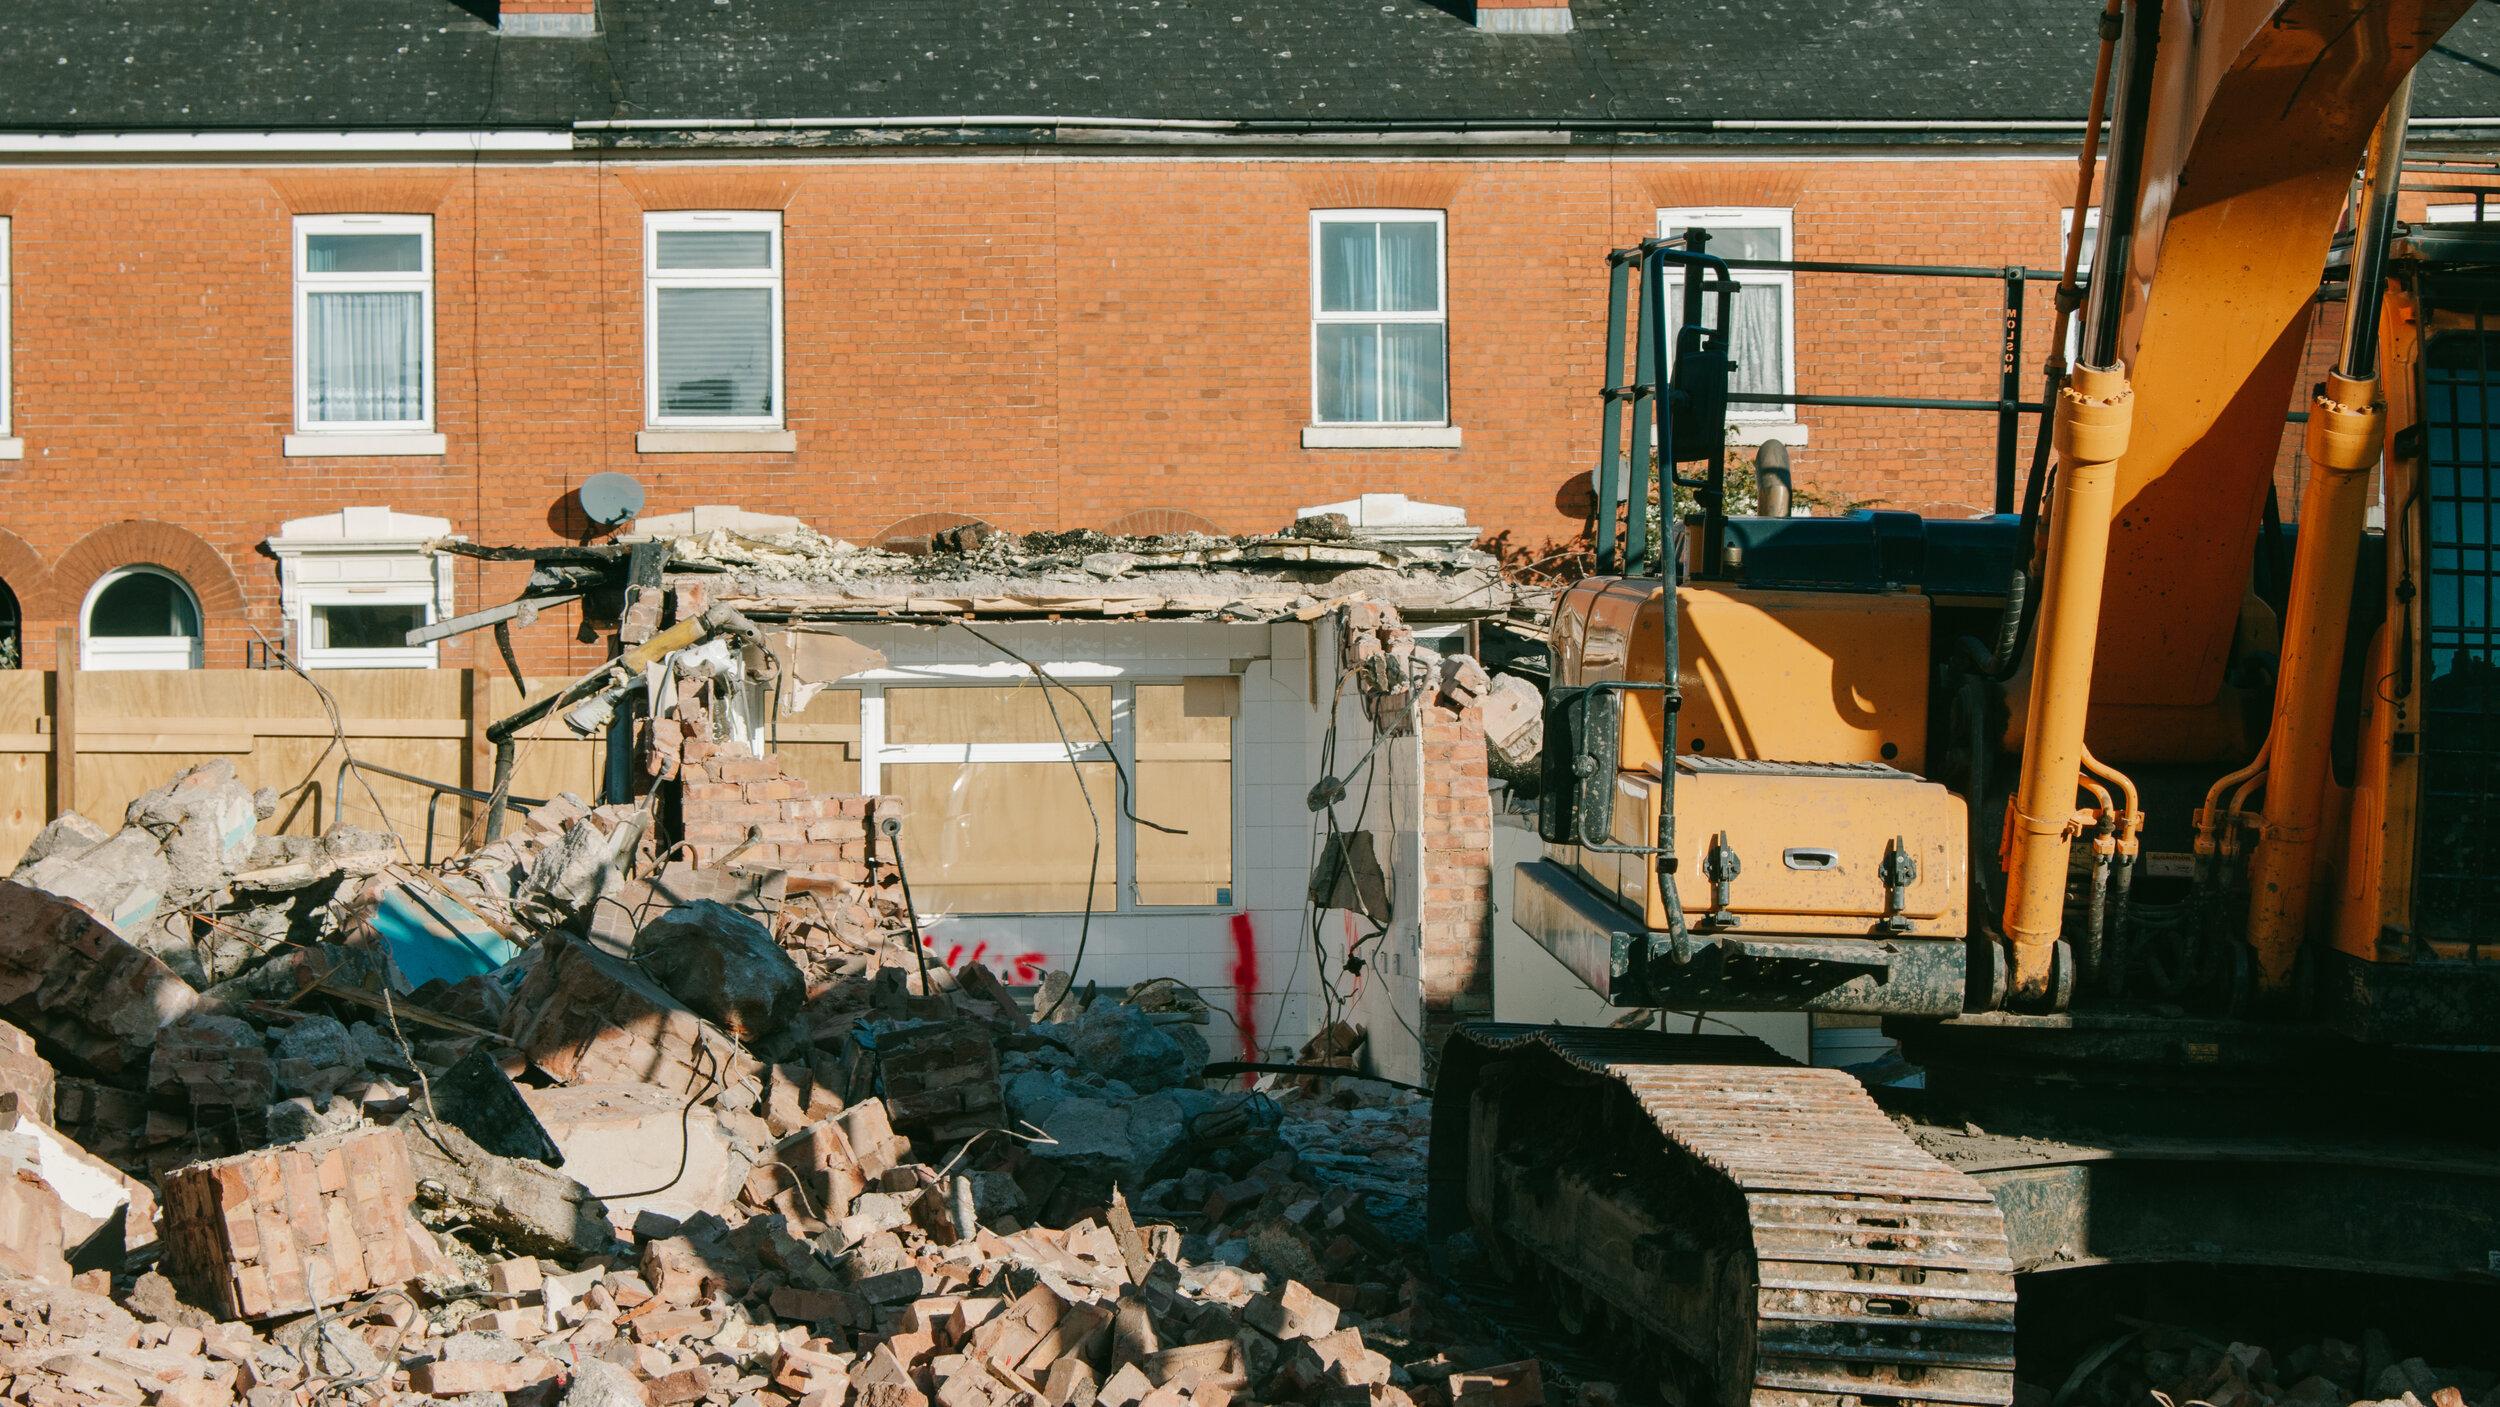 st-johns-harborne-bfm-demolition-oct-19-je-2900.jpg